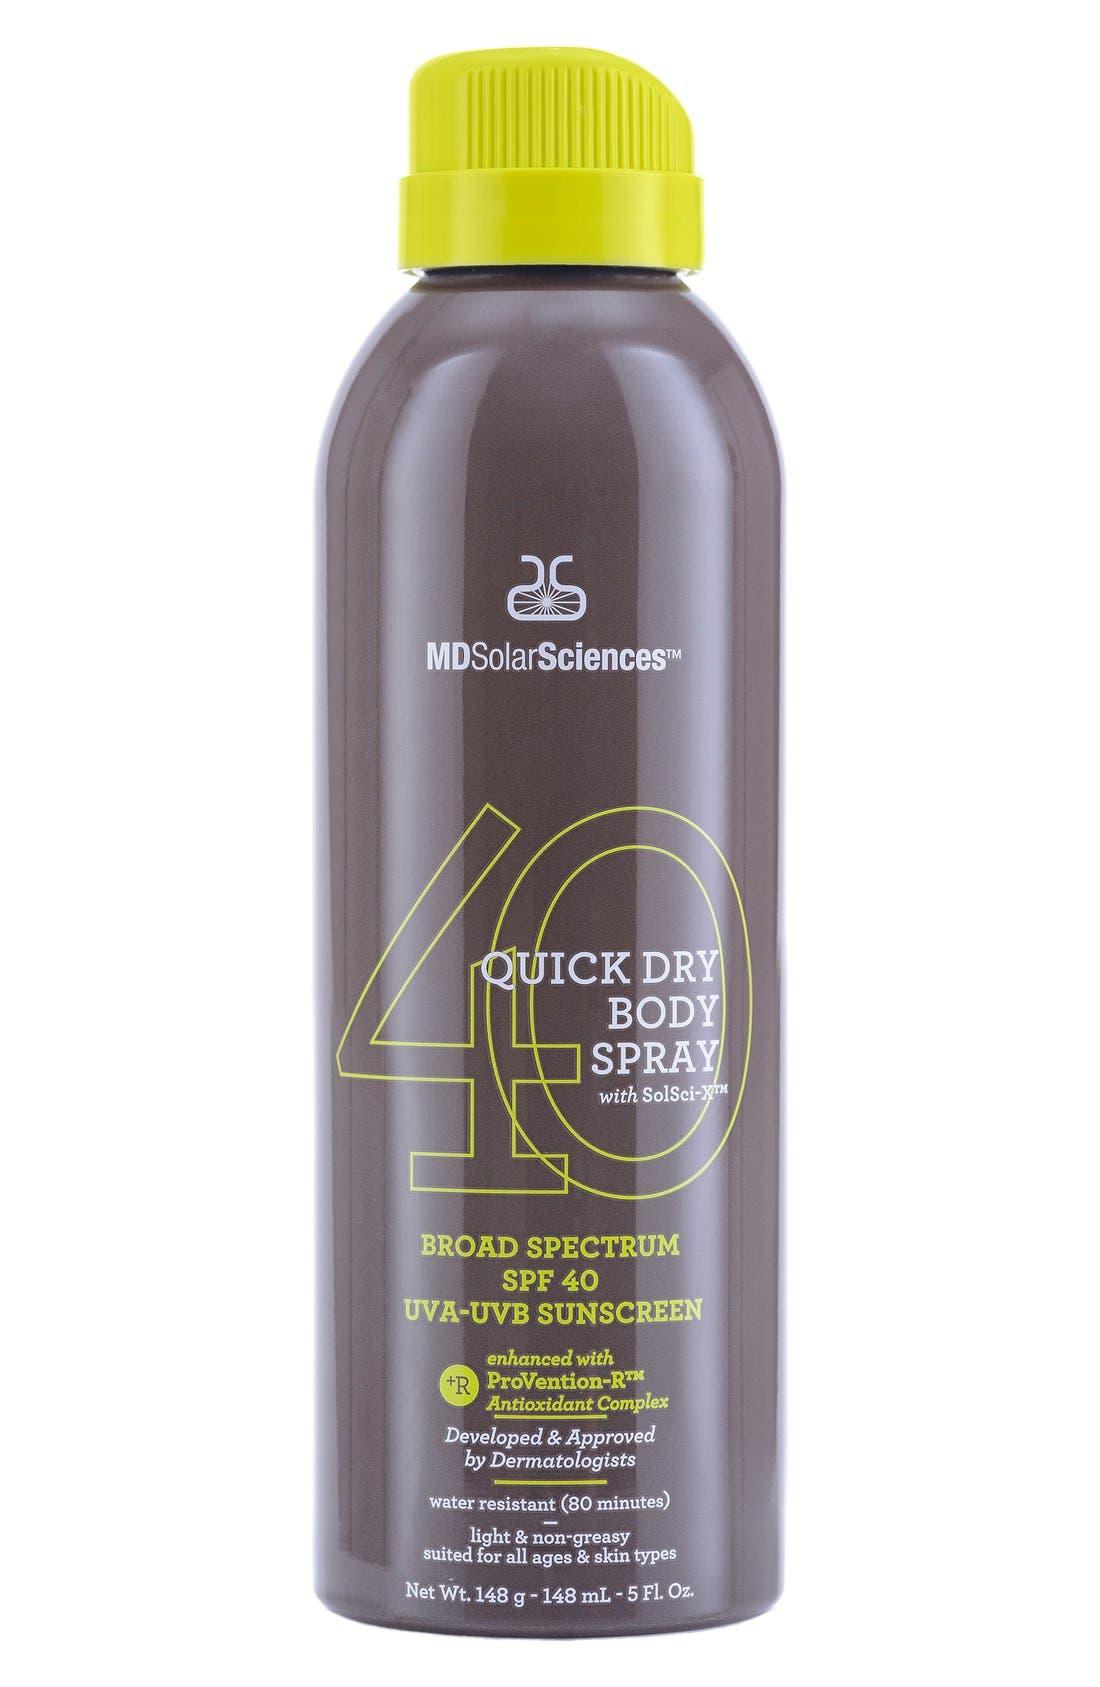 Quick Dry Body Spray Broad Spectrum SPF 40 Sunscreen,                         Main,                         color, 000